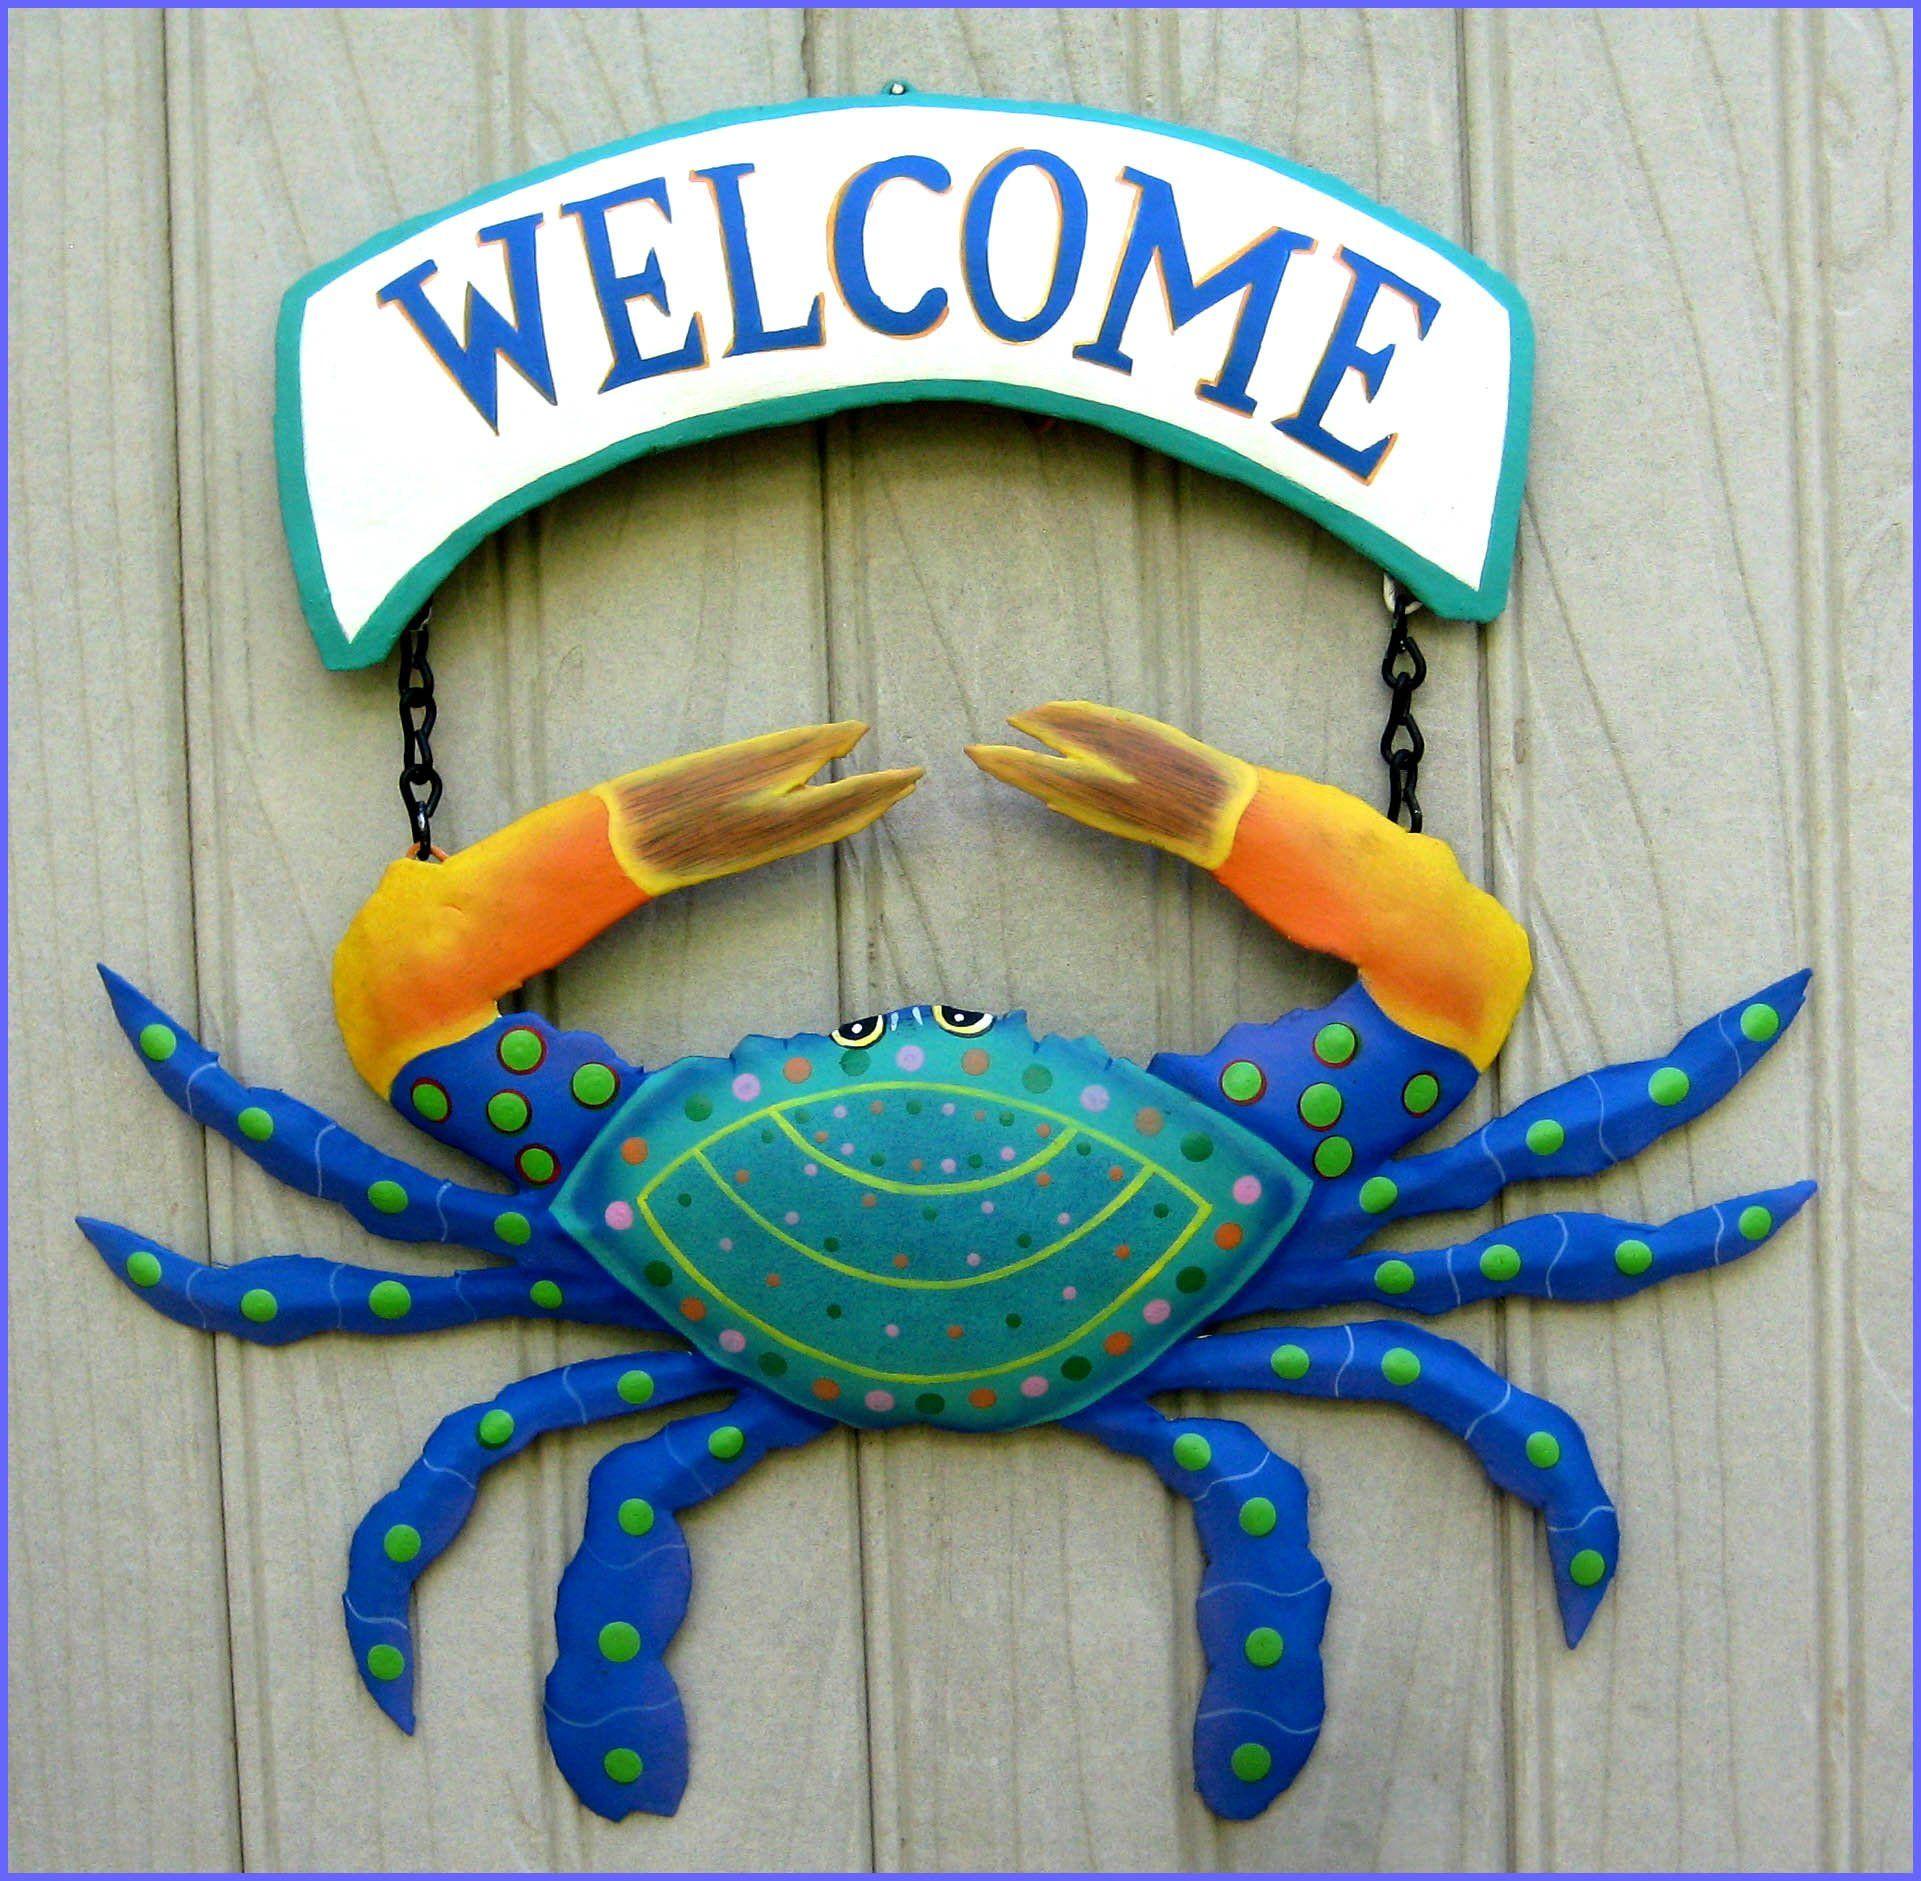 Crab Welcome Sign Coastal Decor Garden Art Wall Hanging Etsy Outdoor Metal Art Tropical Decor Metal Welcome Sign